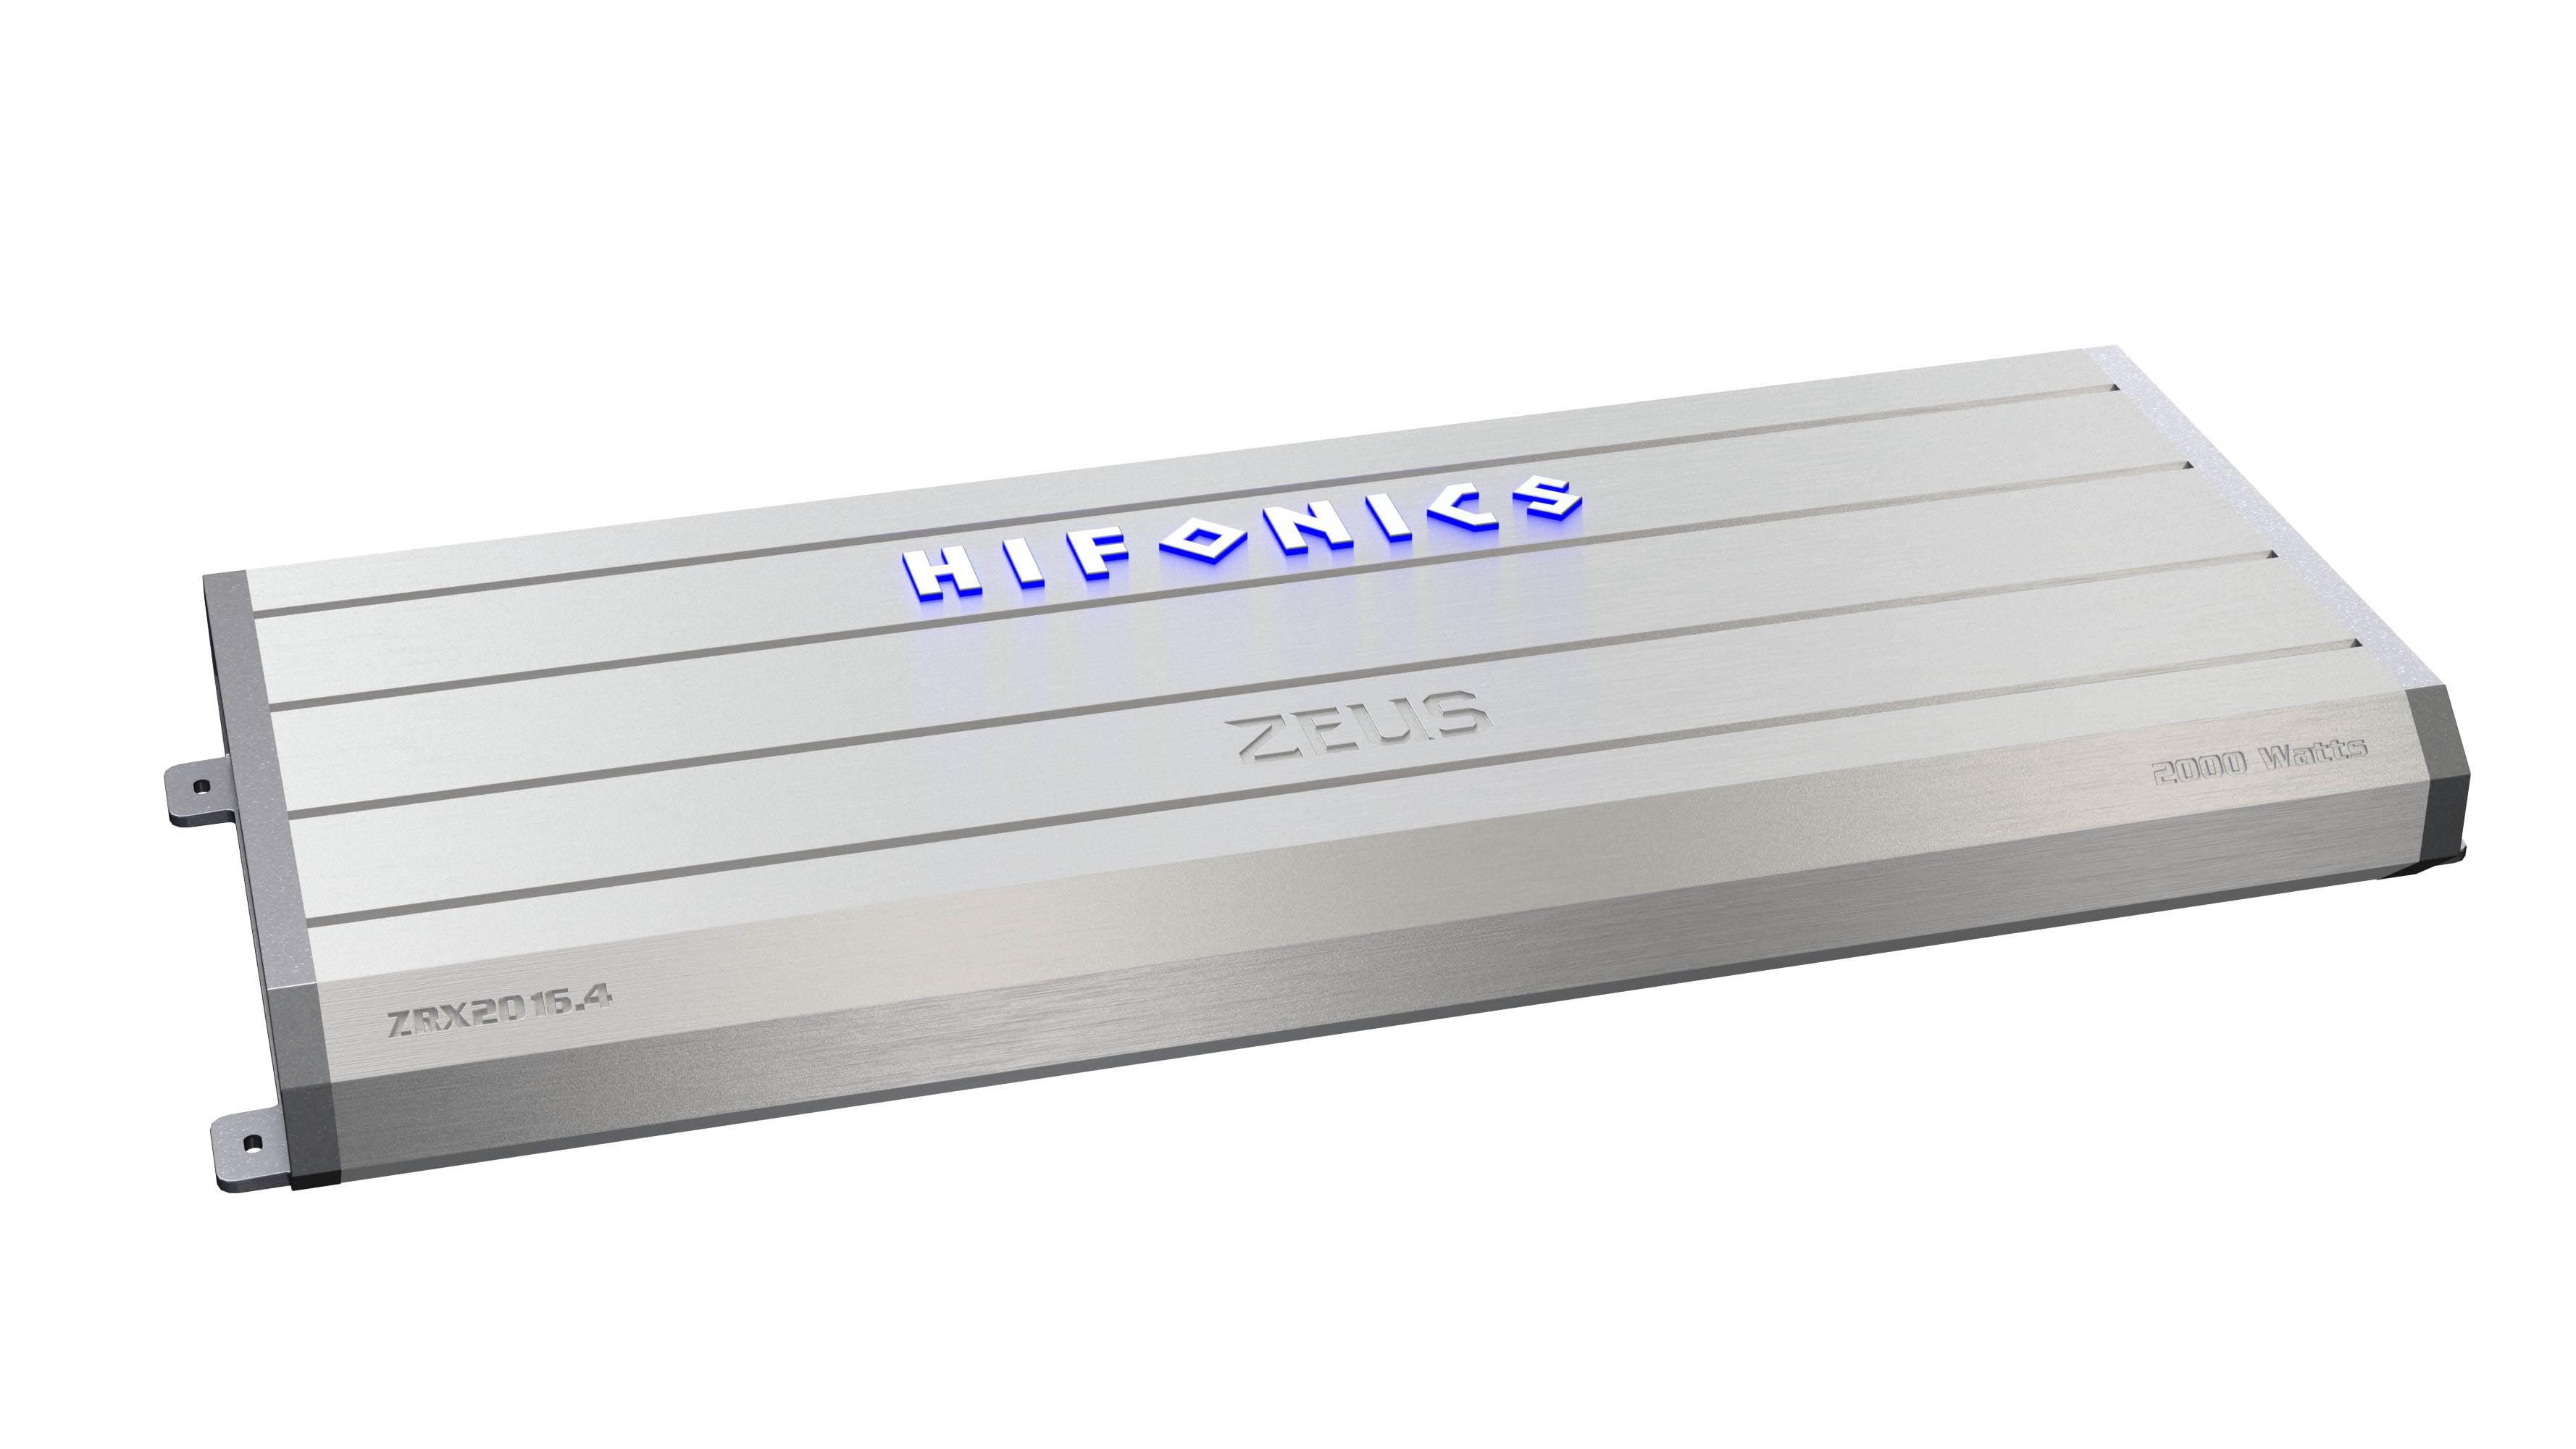 [QNCB_7524]  Hifonics ZX2016.4 Zeus 4-Channel Super A/B Class Amp, 2,000 Watts -  Walmart.com - Walmart.com | Brutus Hifonics Wiring Diagram 2000 |  | Walmart